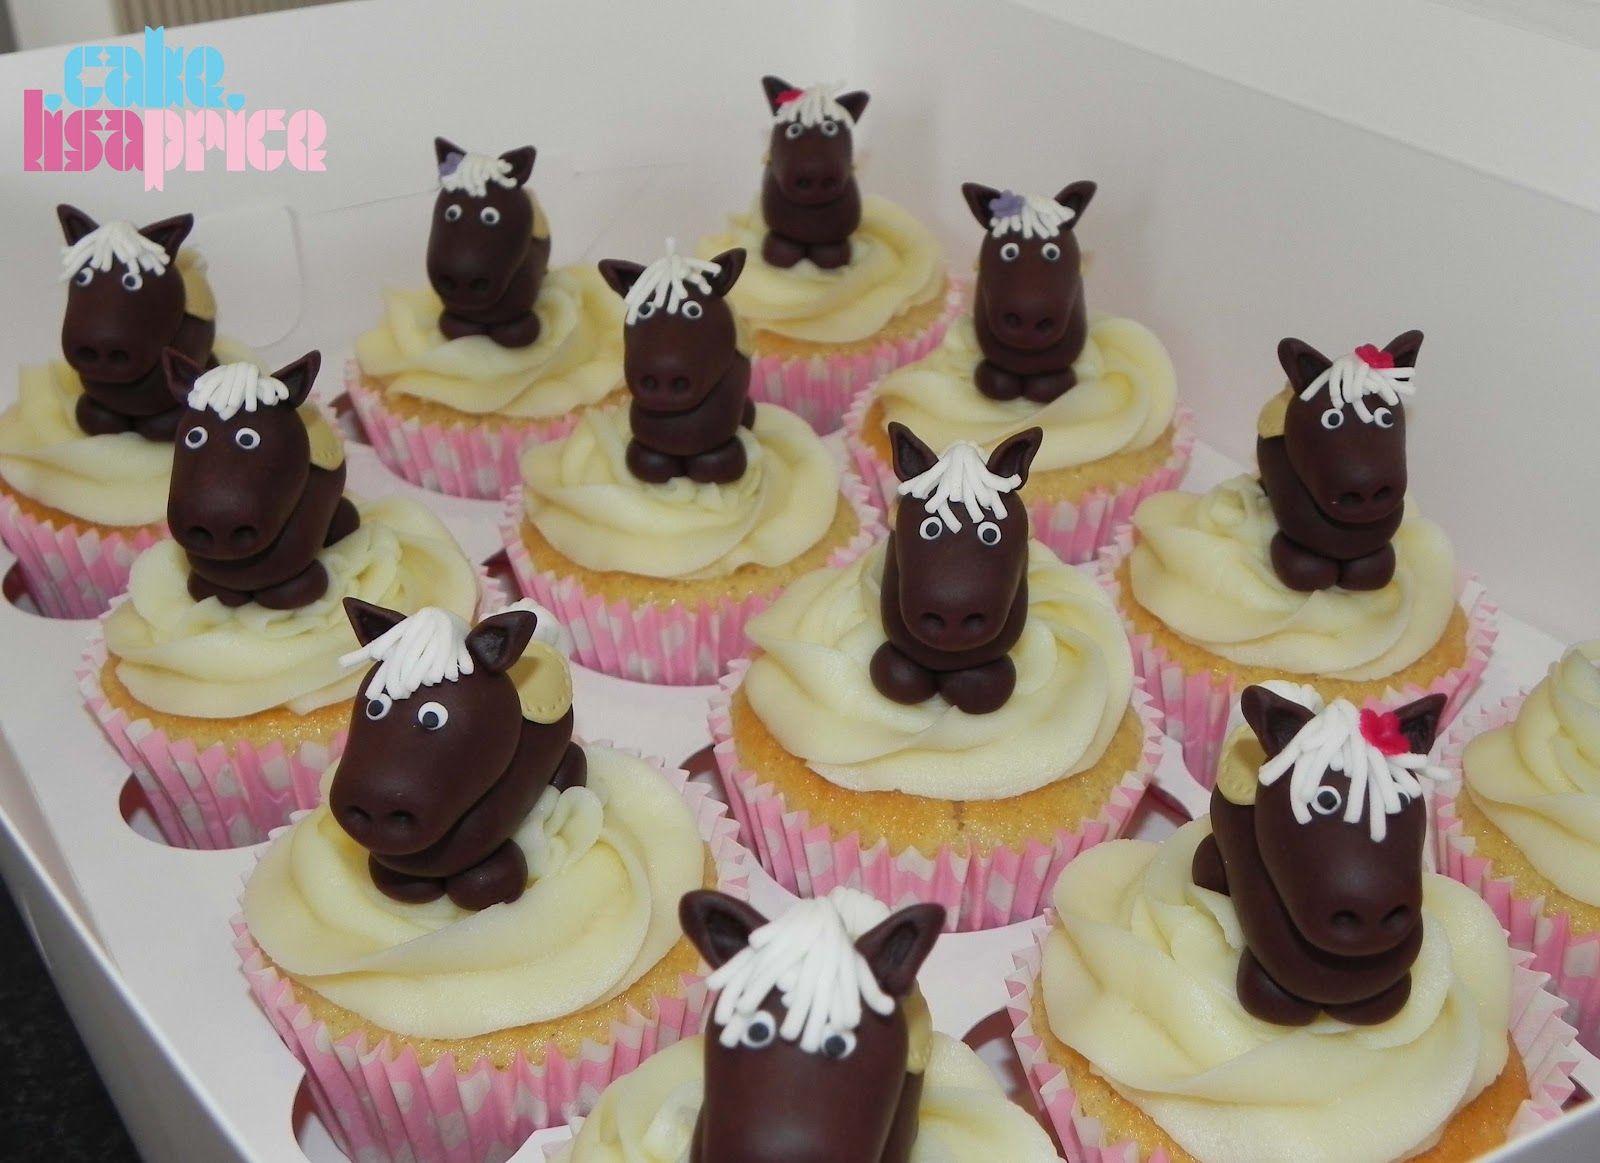 horsecupcakes Equestrian Cakes and Horse Treats Pinterest